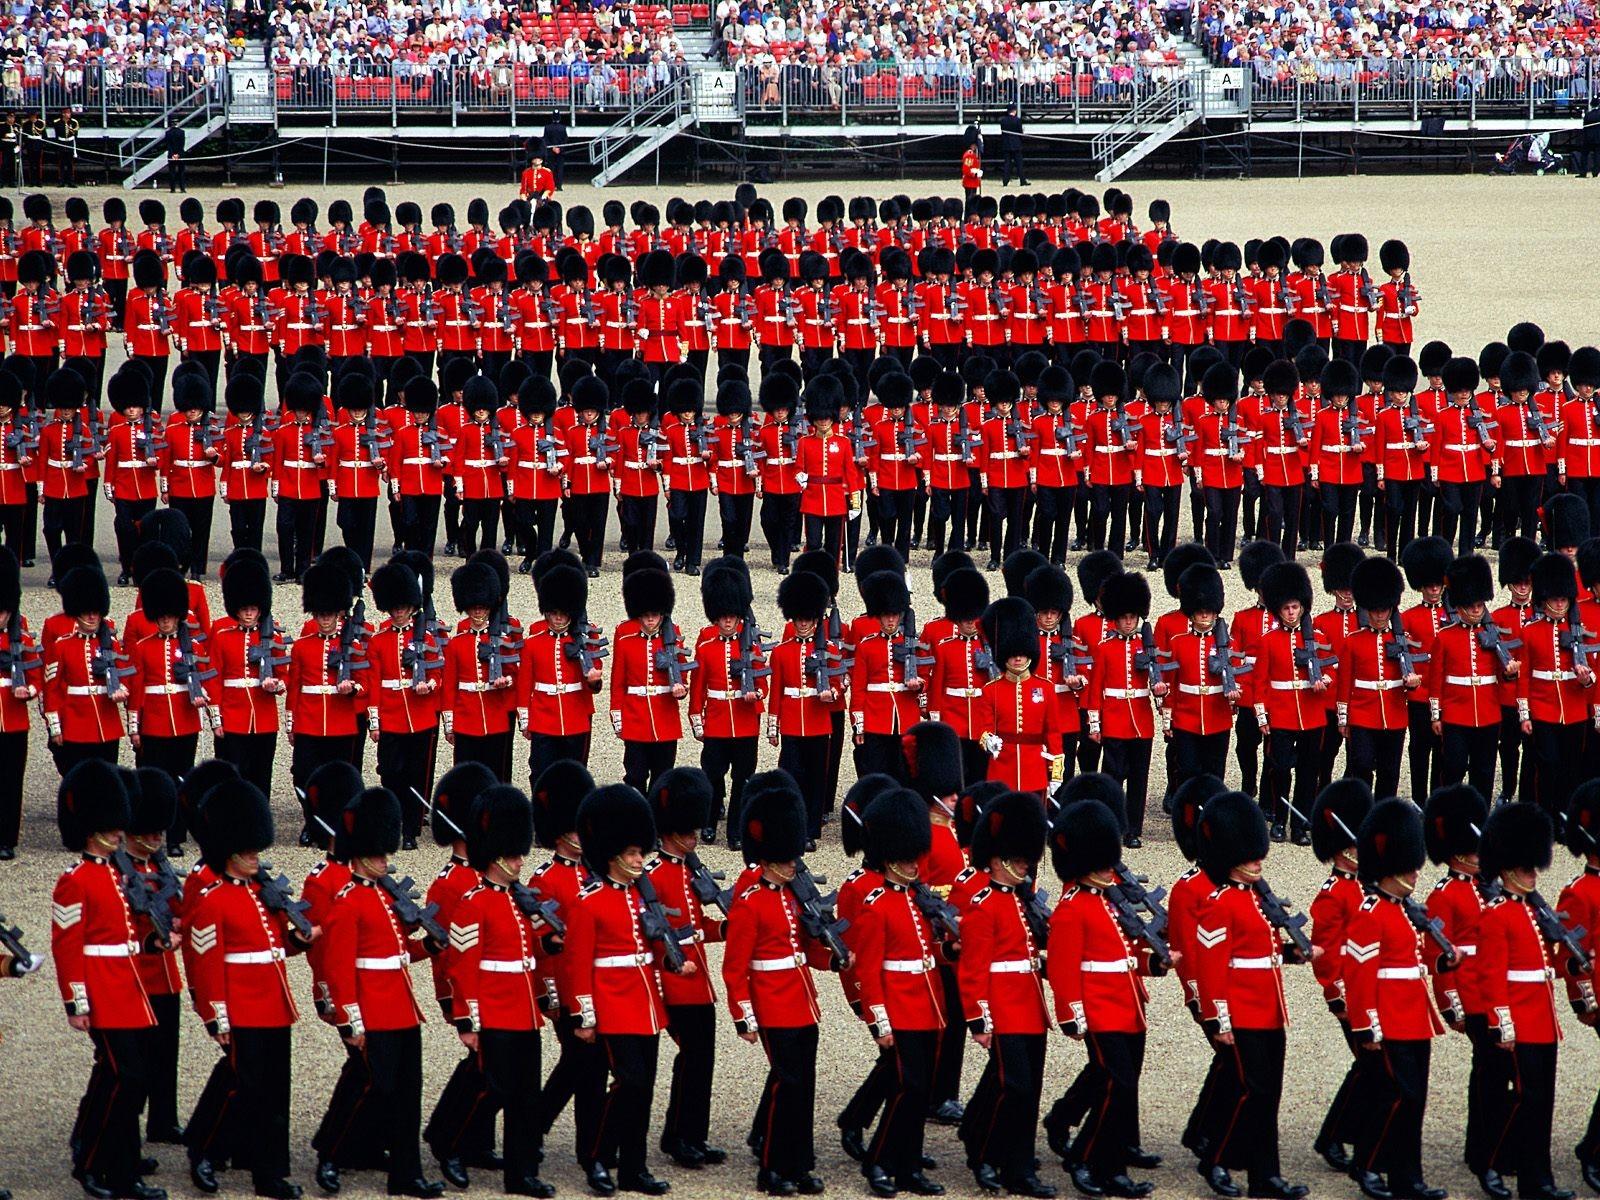 Wallpaper London Soldier Team Musician Person Parade